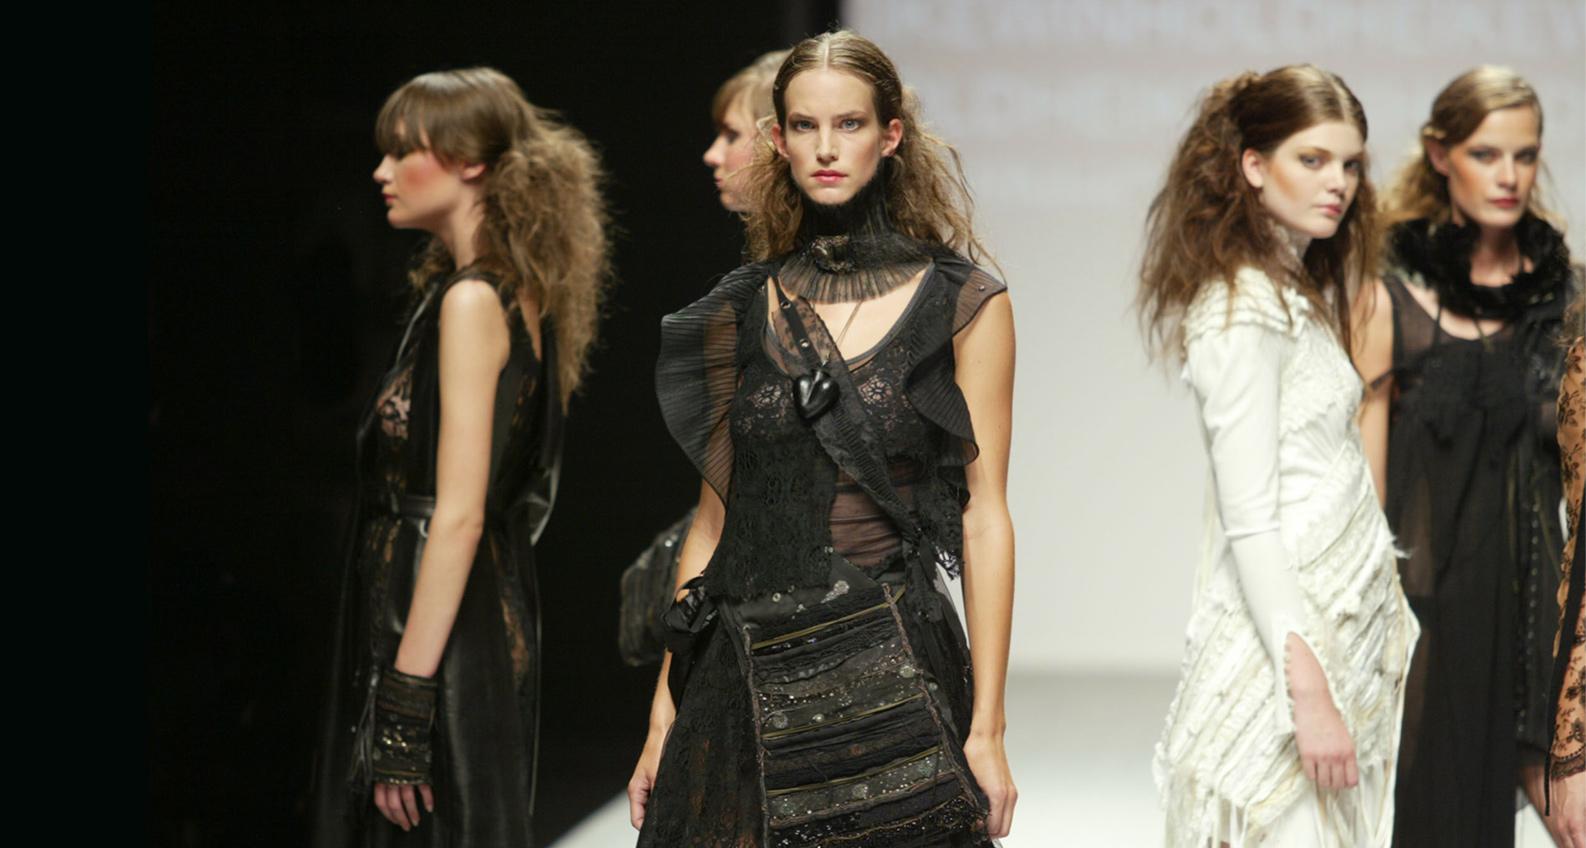 Heike Winhold, Modedesign, Modenschau